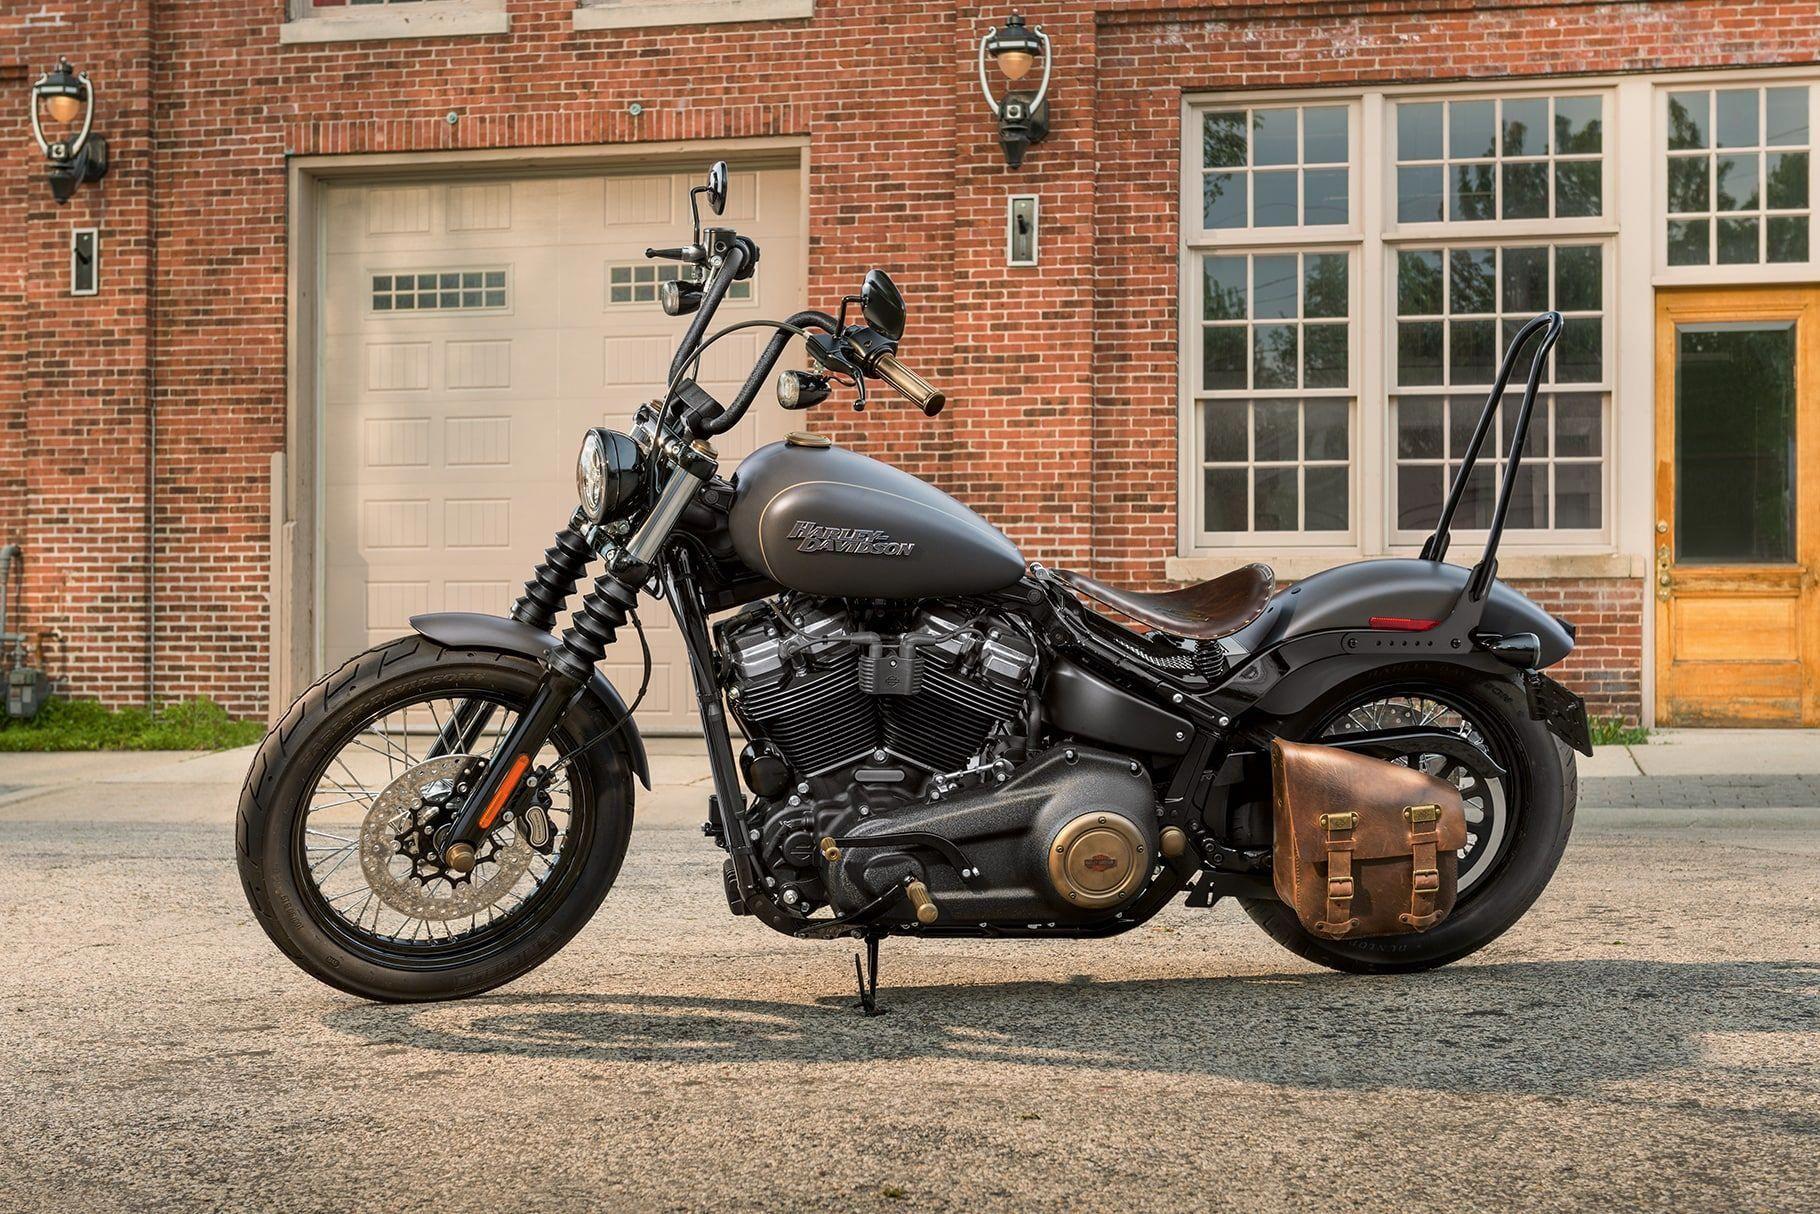 Motorcycles 2019 Vanderhall Ve 8975001: 2019 Street Bob #HarleyDavidsonCustom